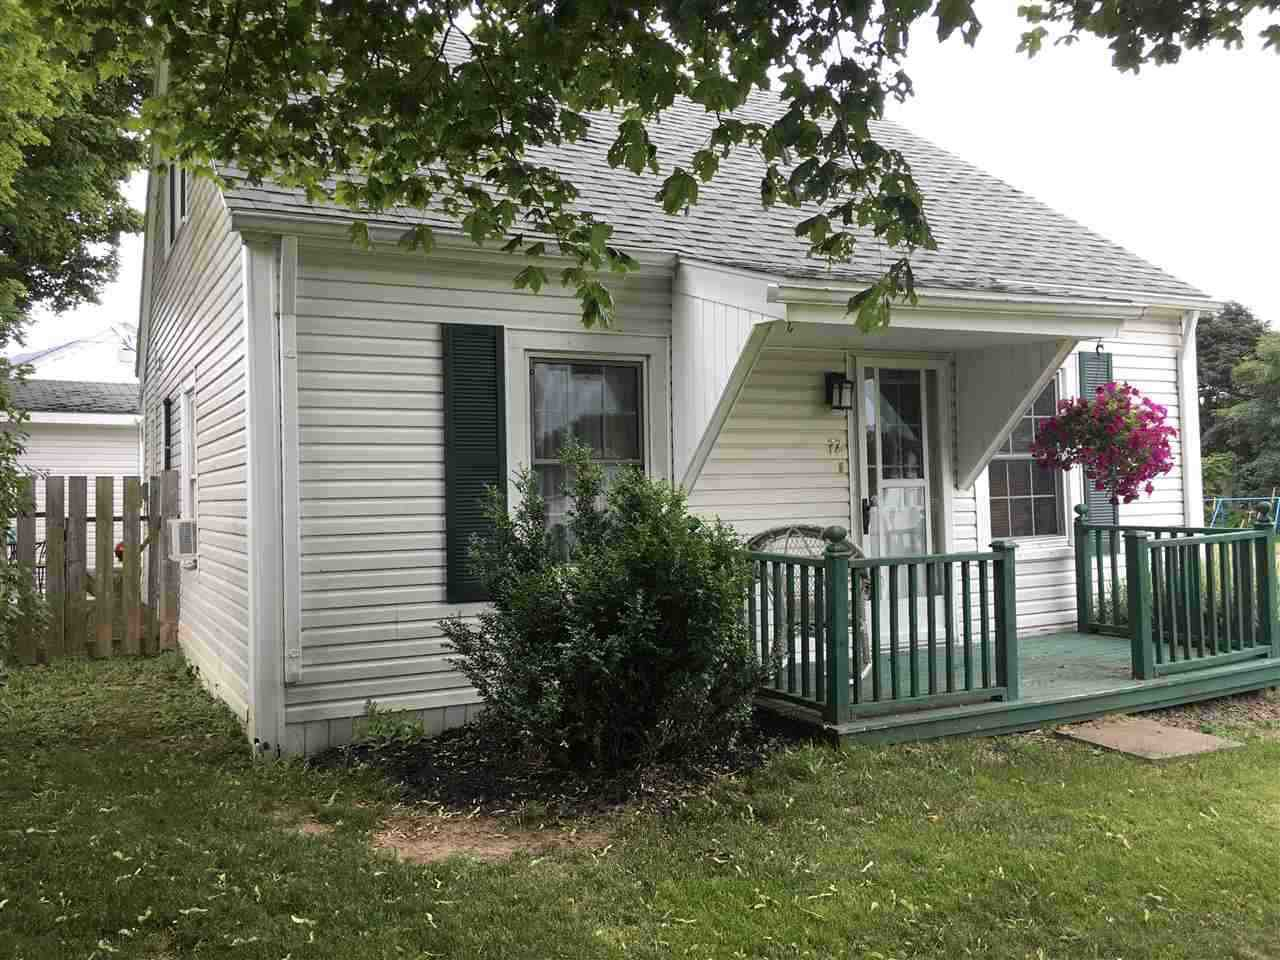 Main Photo: 72 Cedar Street in Pictou: 107-Trenton,Westville,Pictou Residential for sale (Northern Region)  : MLS®# 202017230